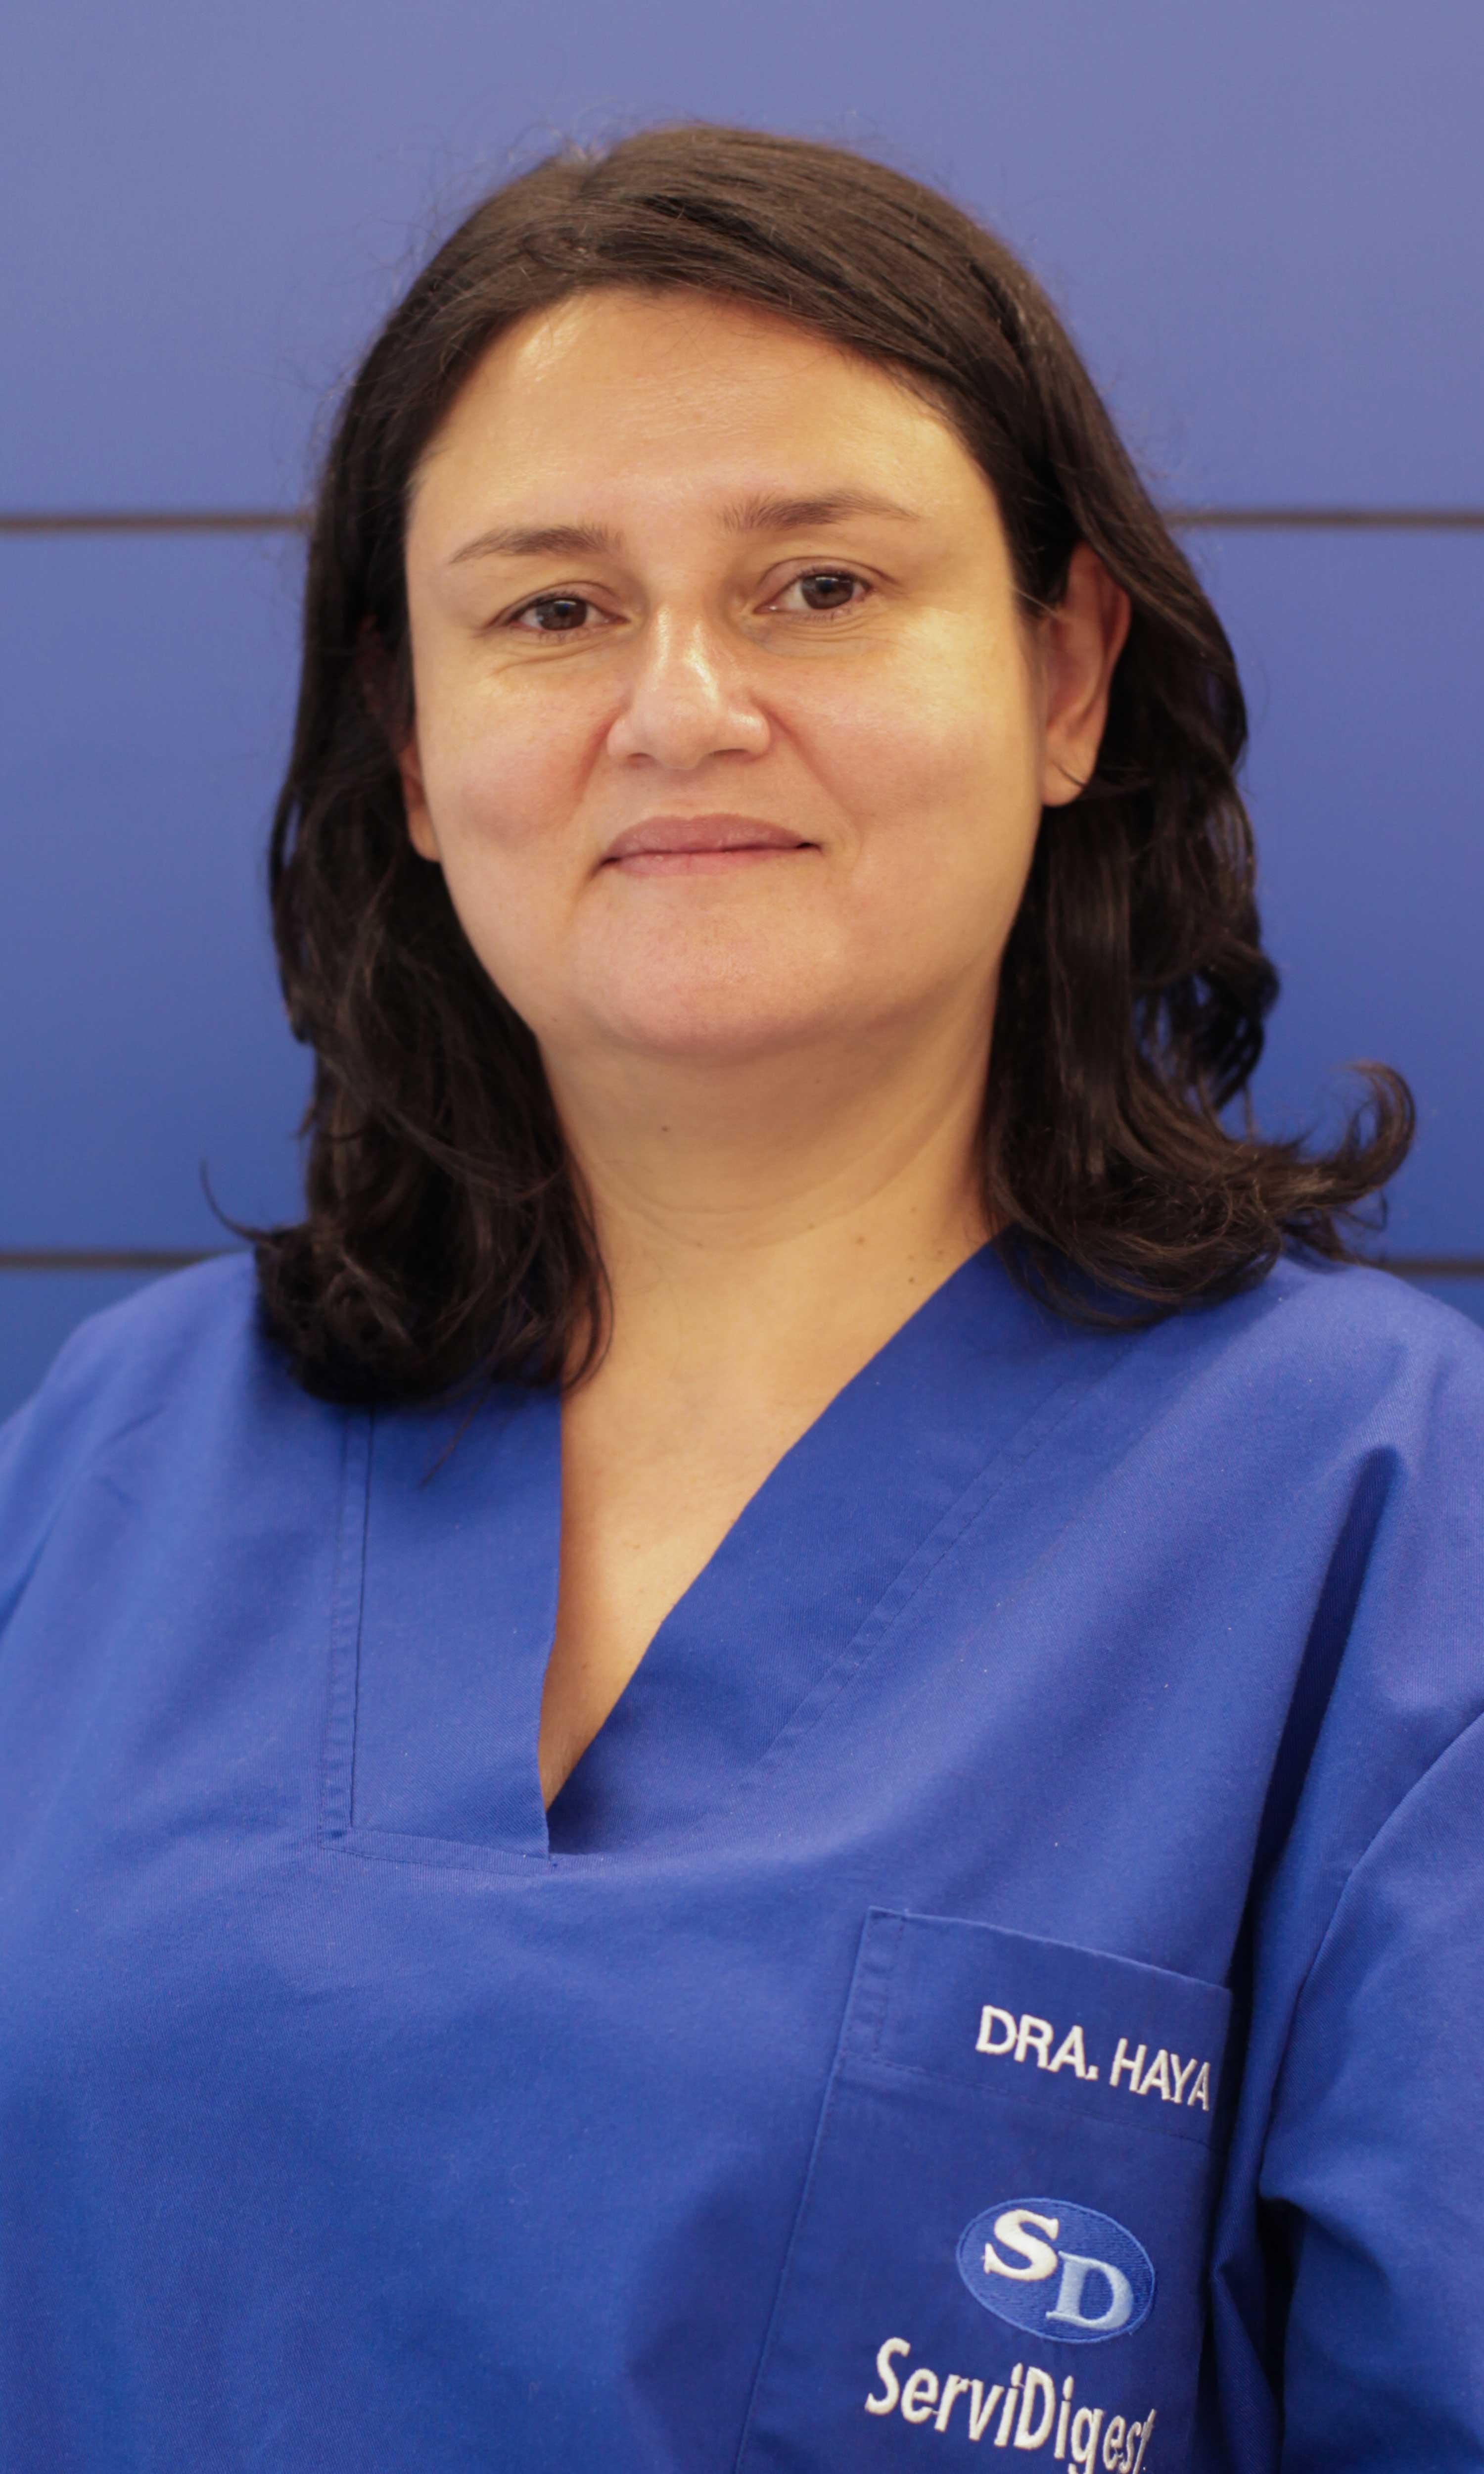 Doctora Haya Hidalgo